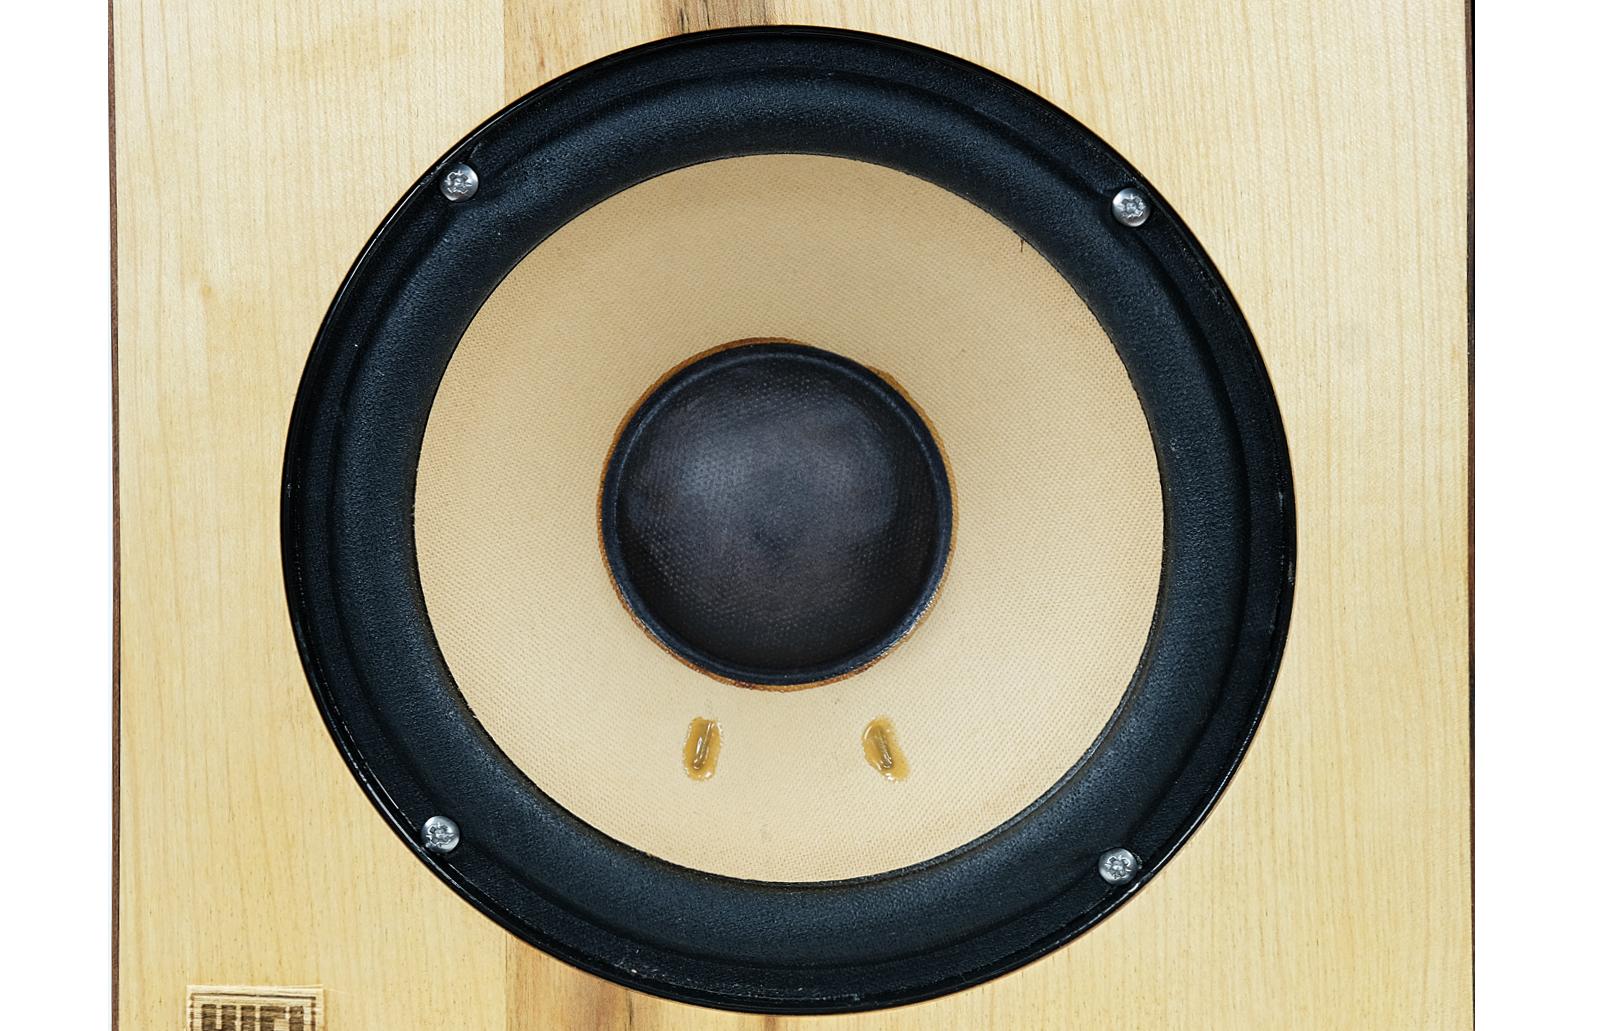 Akai SR-1040 HI-FI Stereo